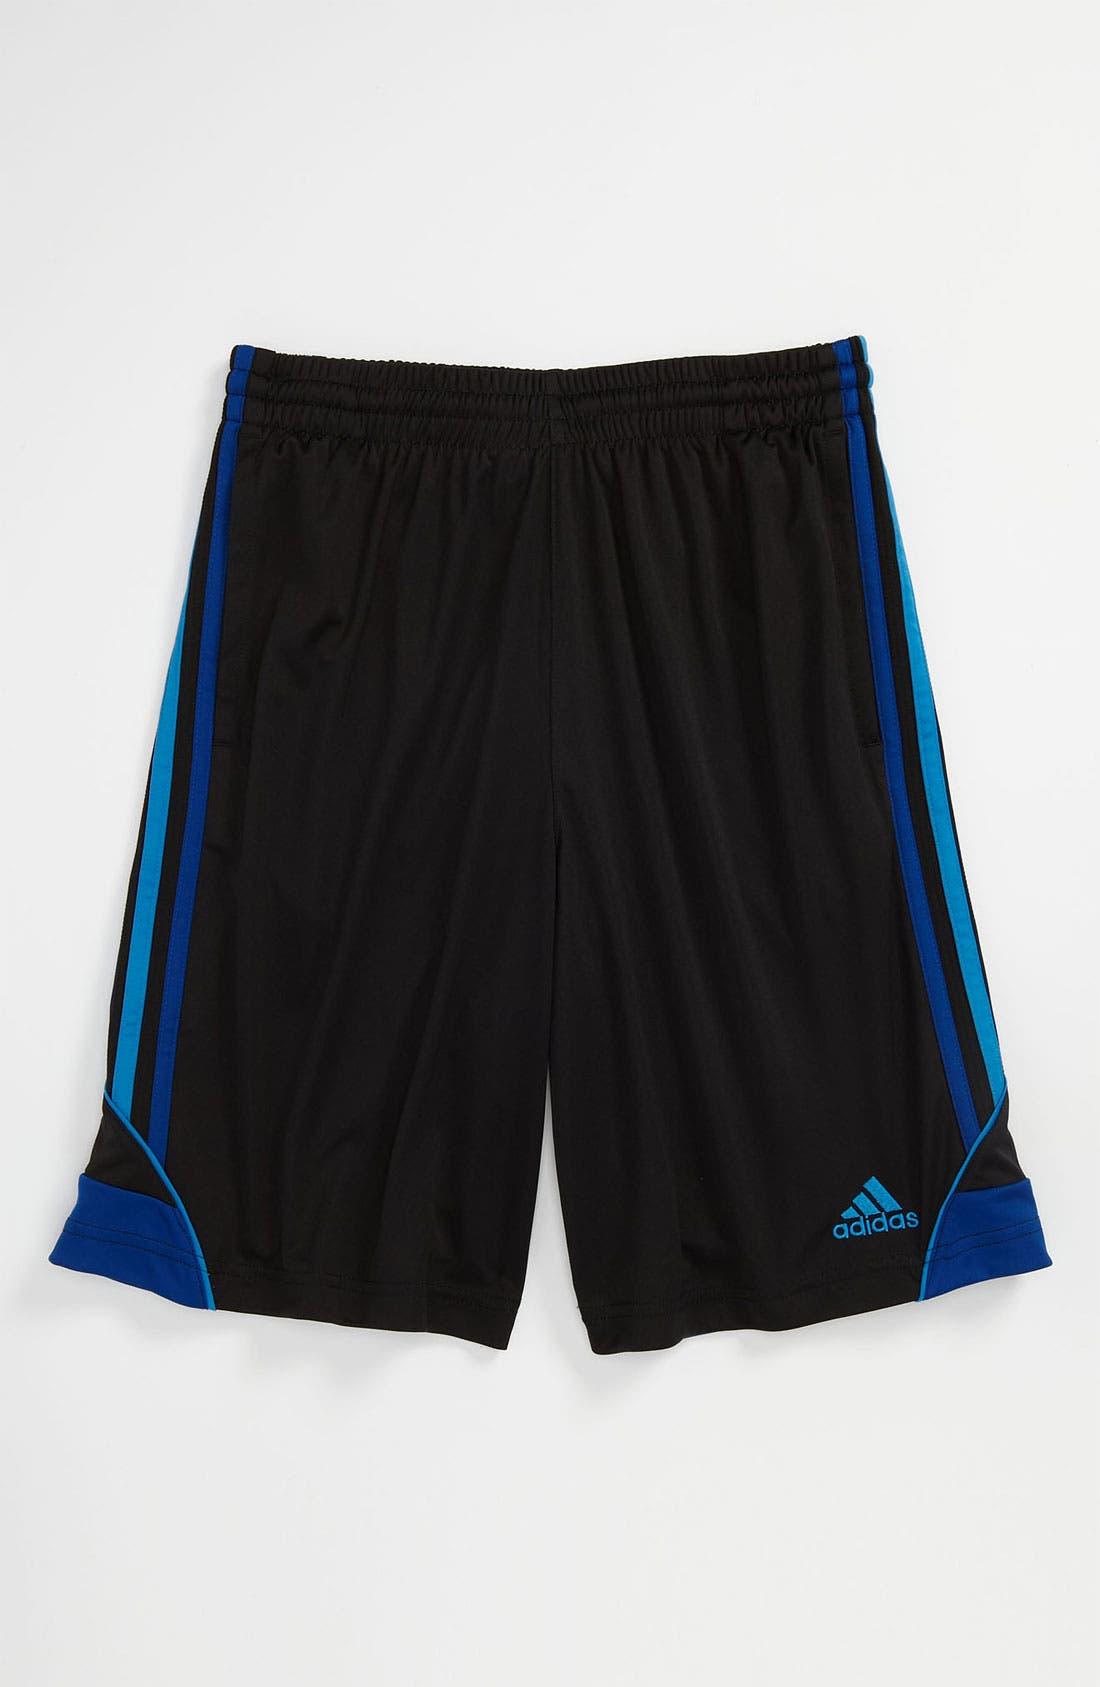 Alternate Image 1 Selected - adidas '3G Speed' Shorts (Big Boys)